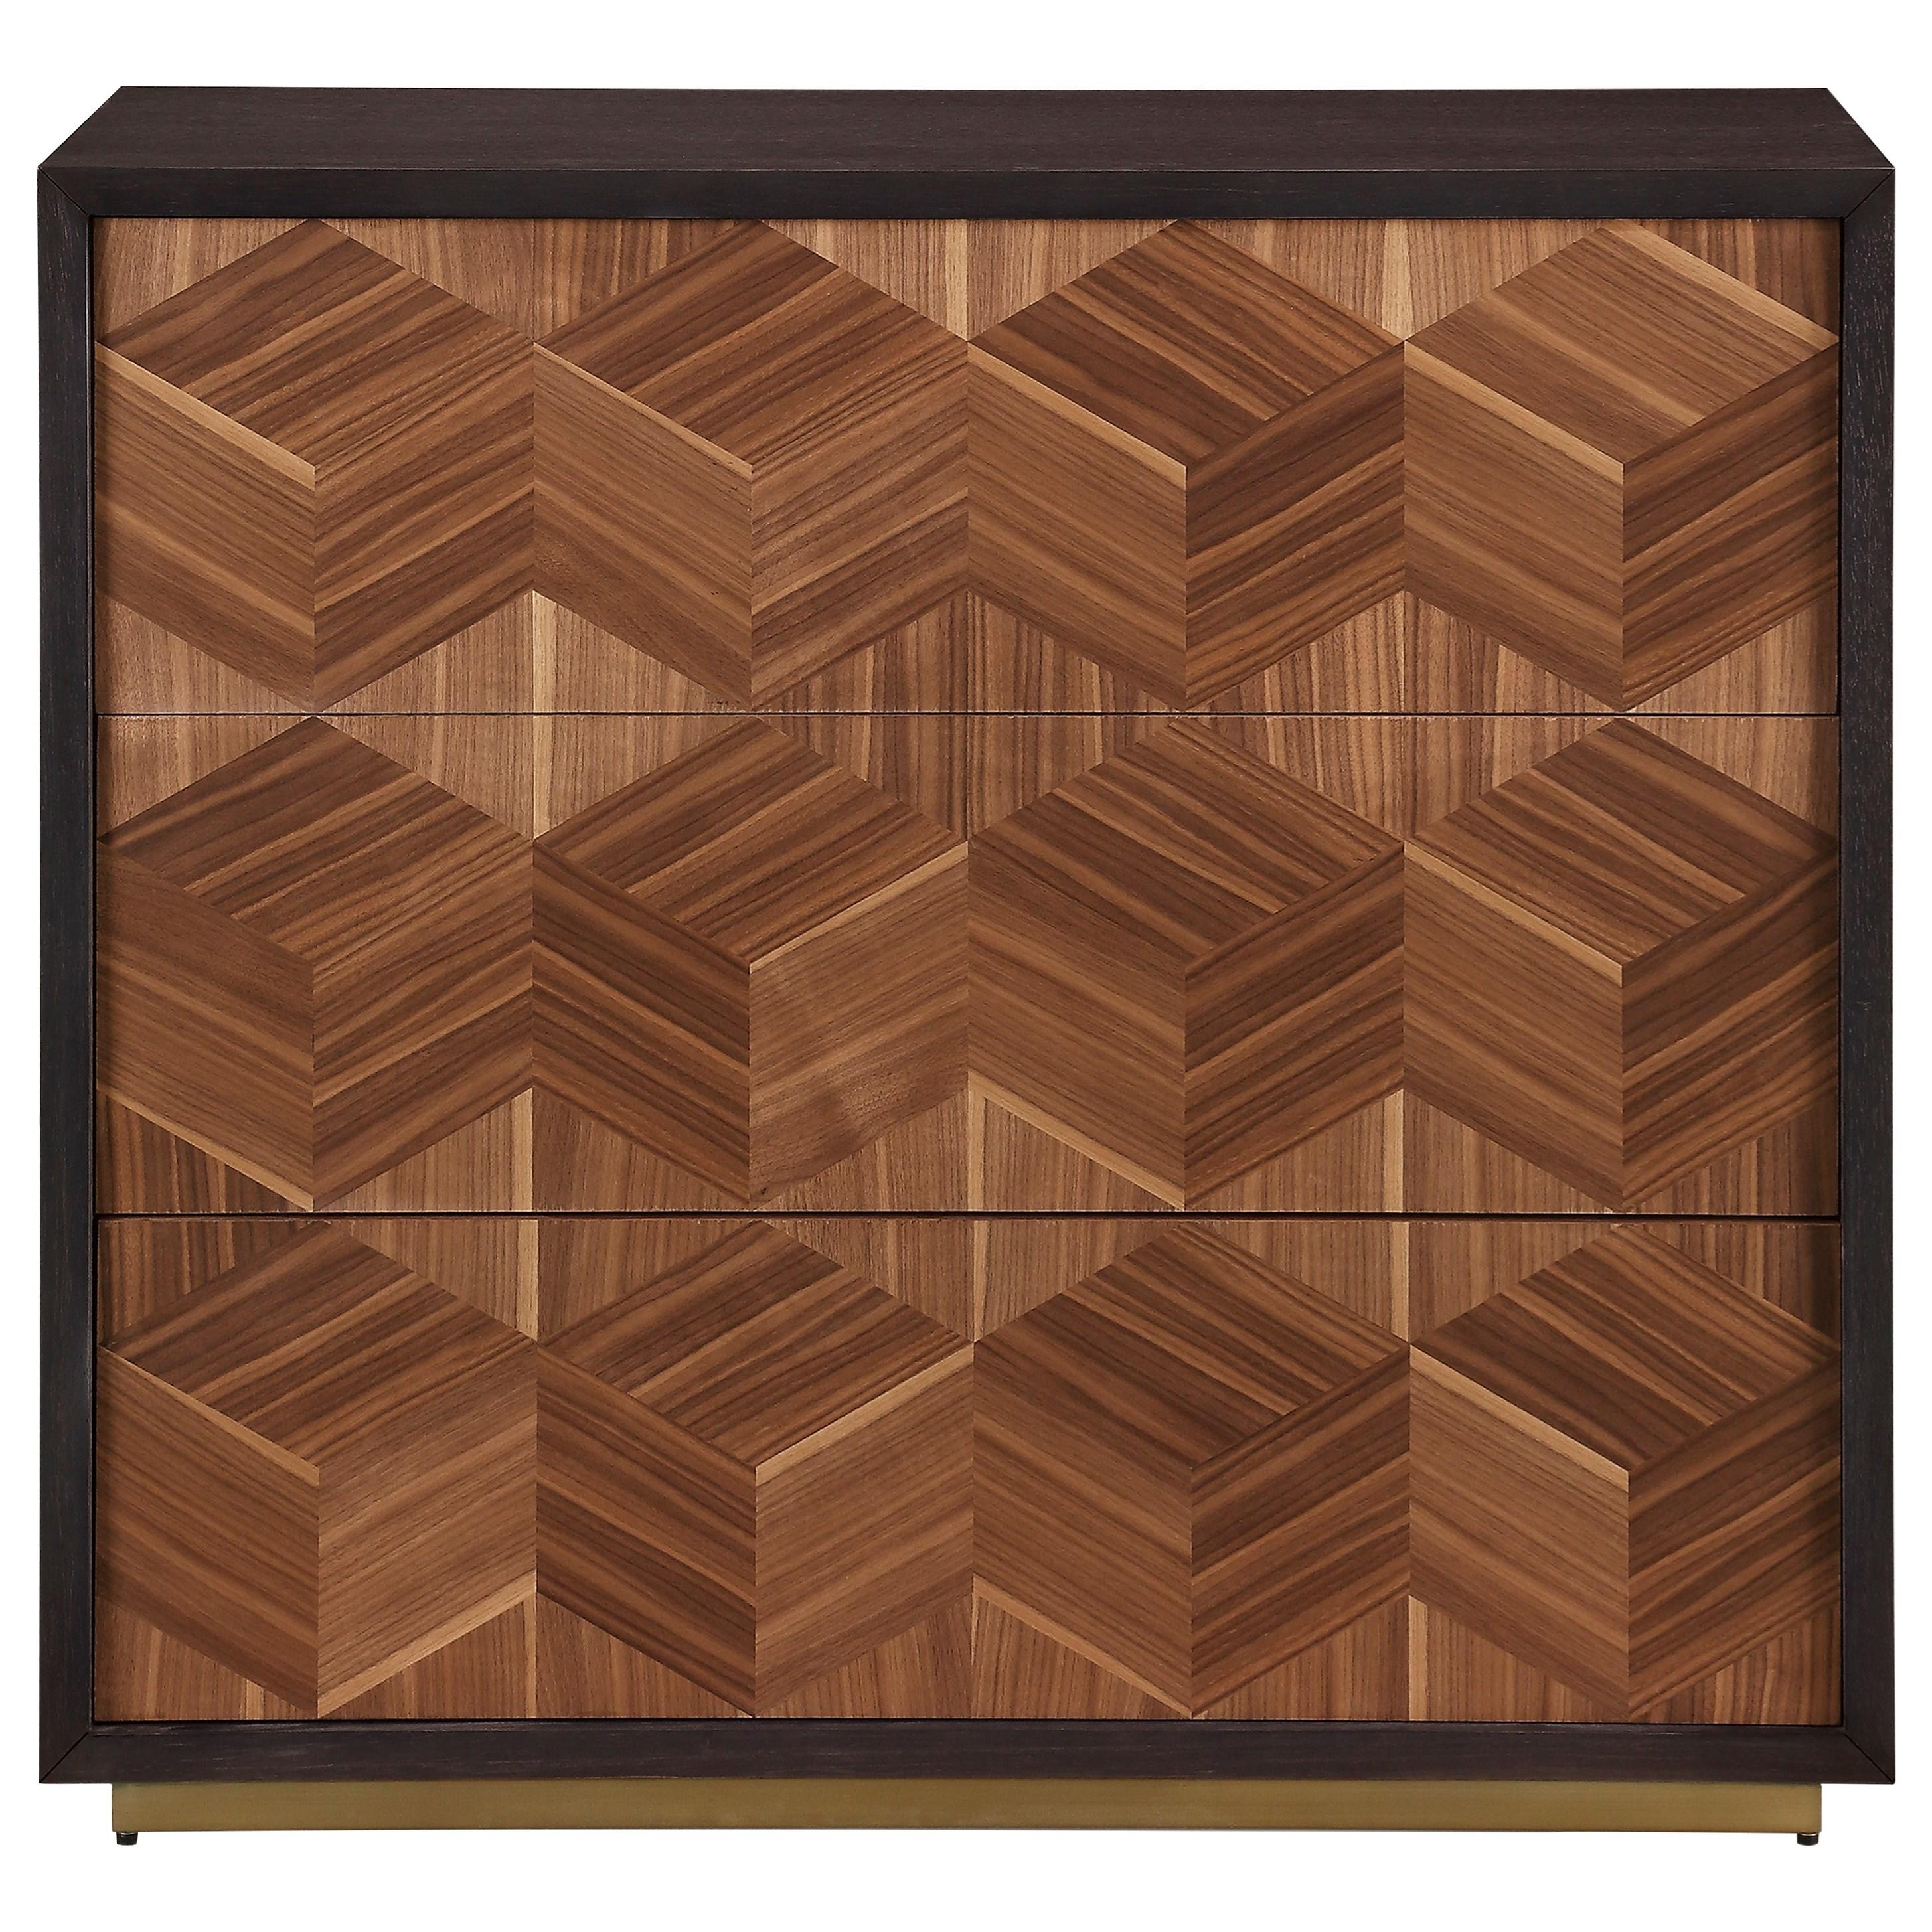 Bobby Berk Brekke Drawer Chest by A.R.T. Furniture Inc at Michael Alan Furniture & Design